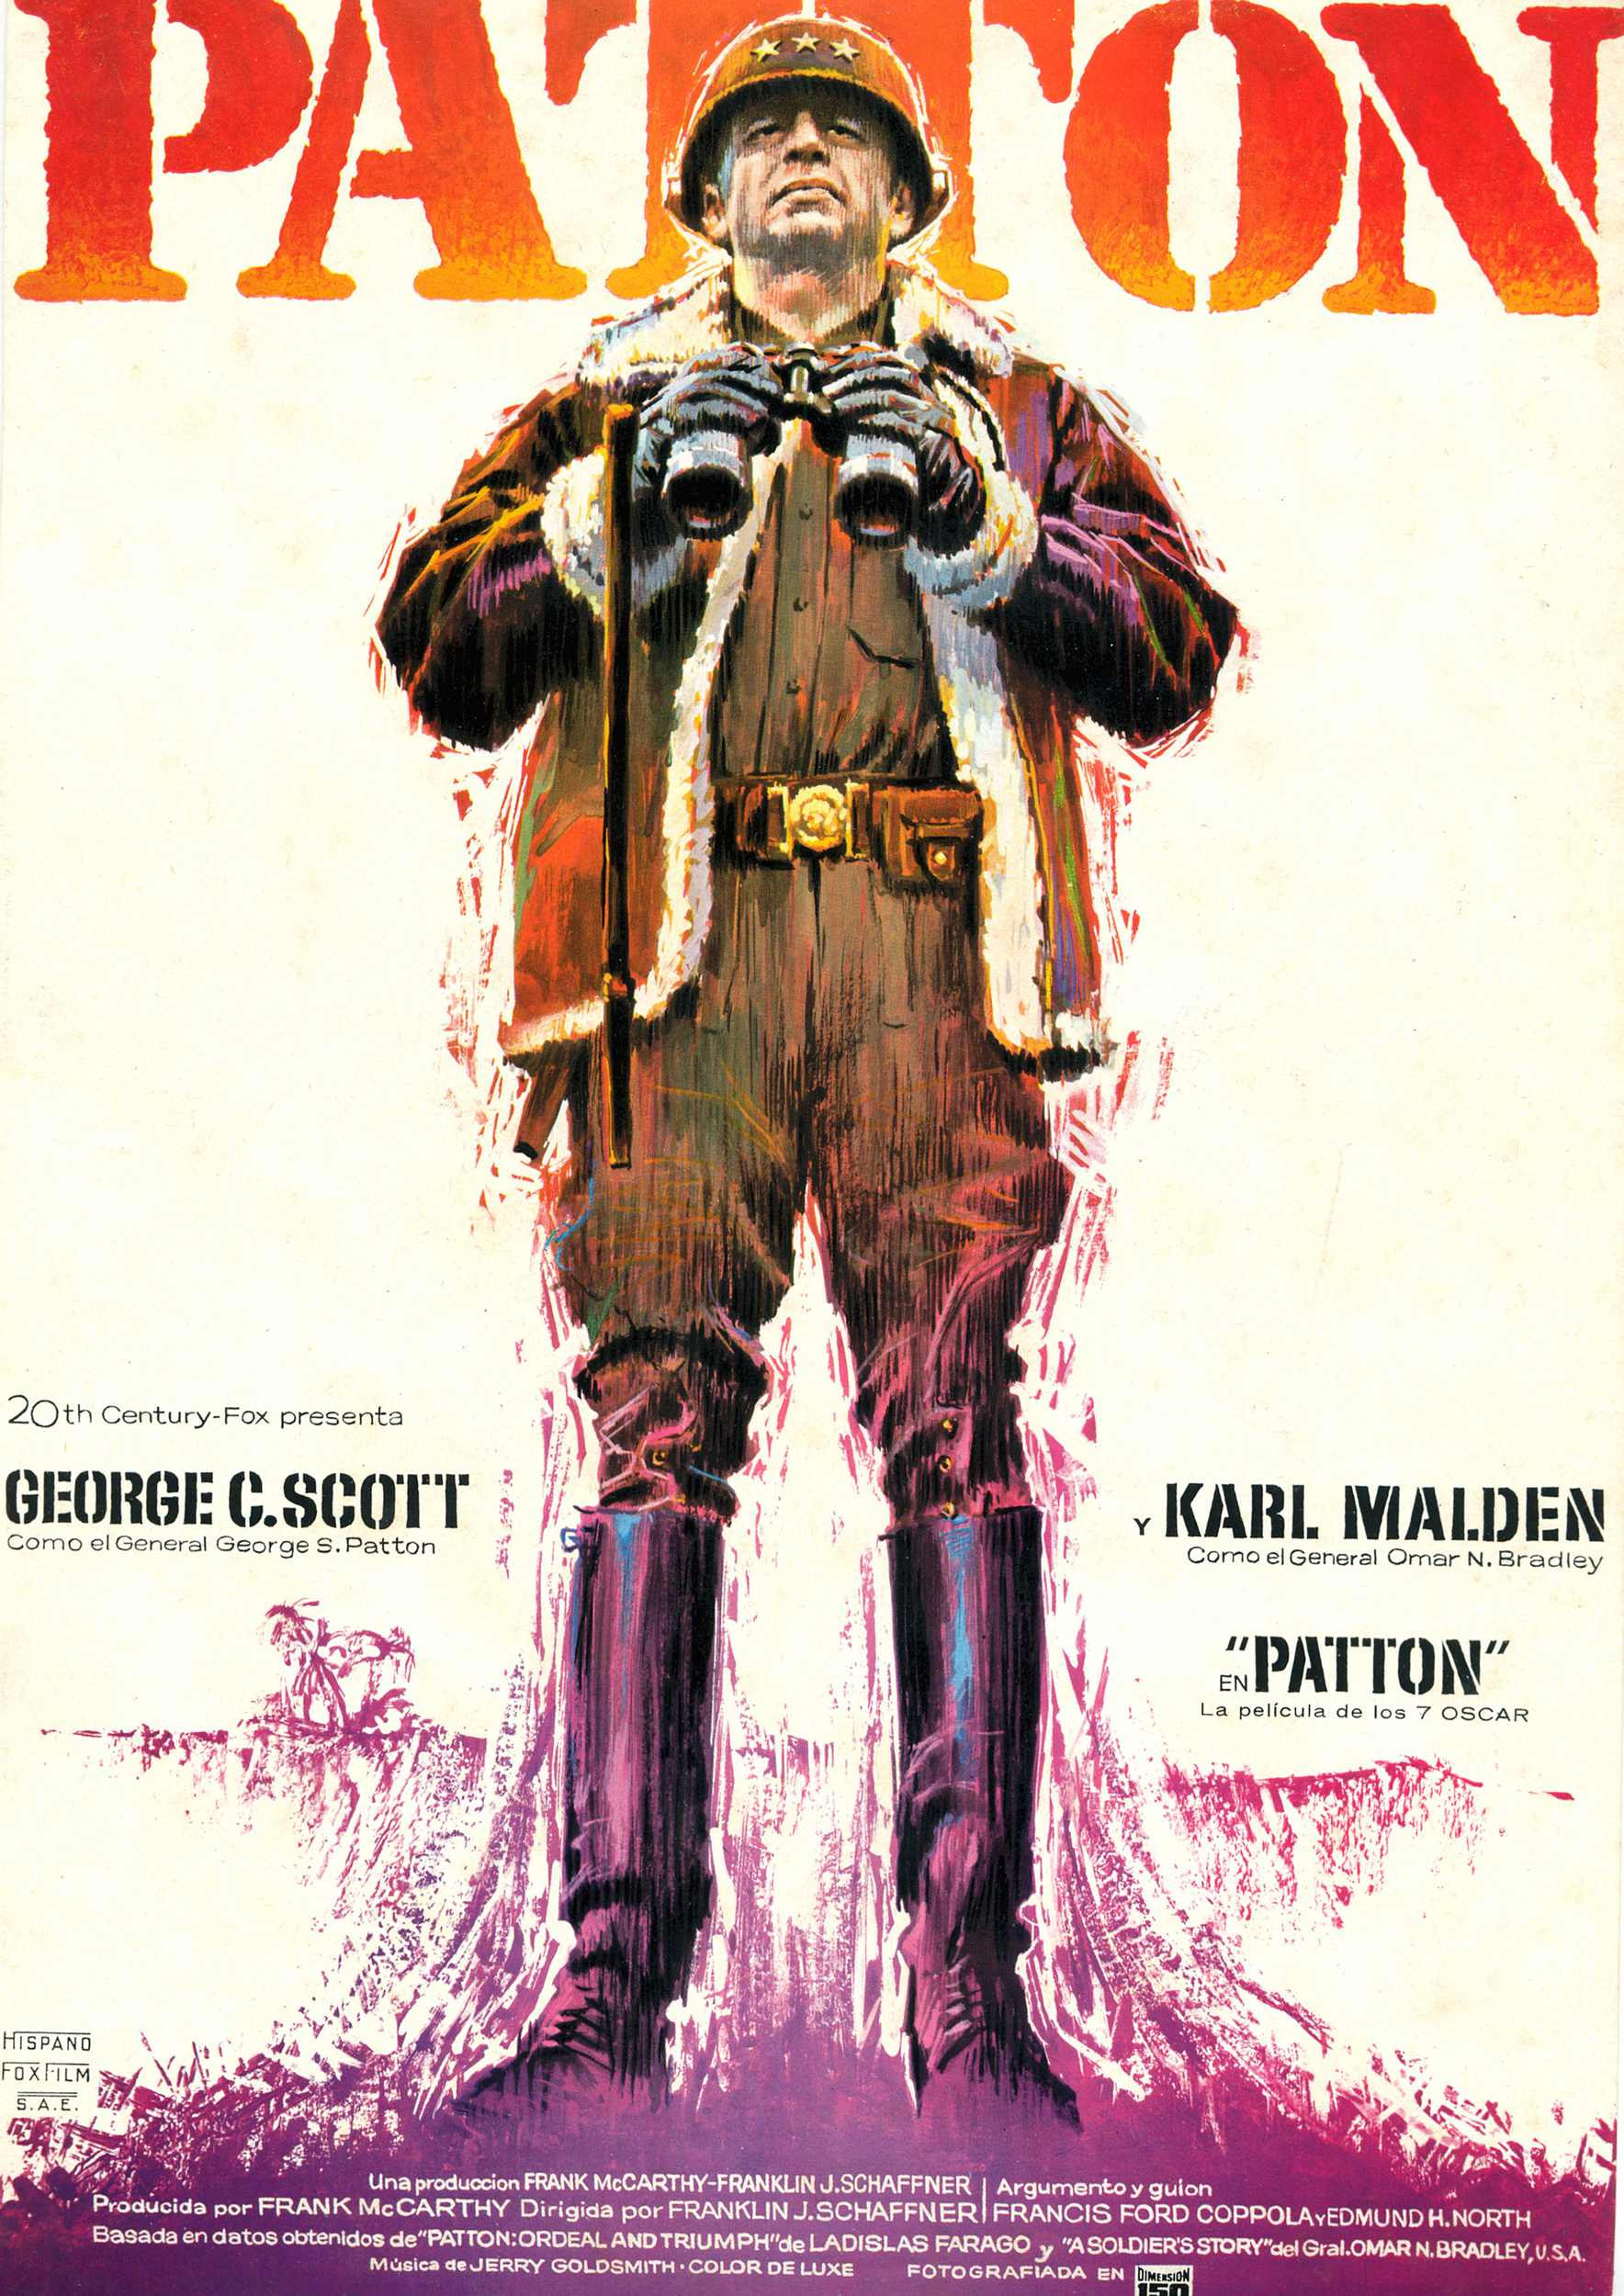 Patton (Patton) (1969)